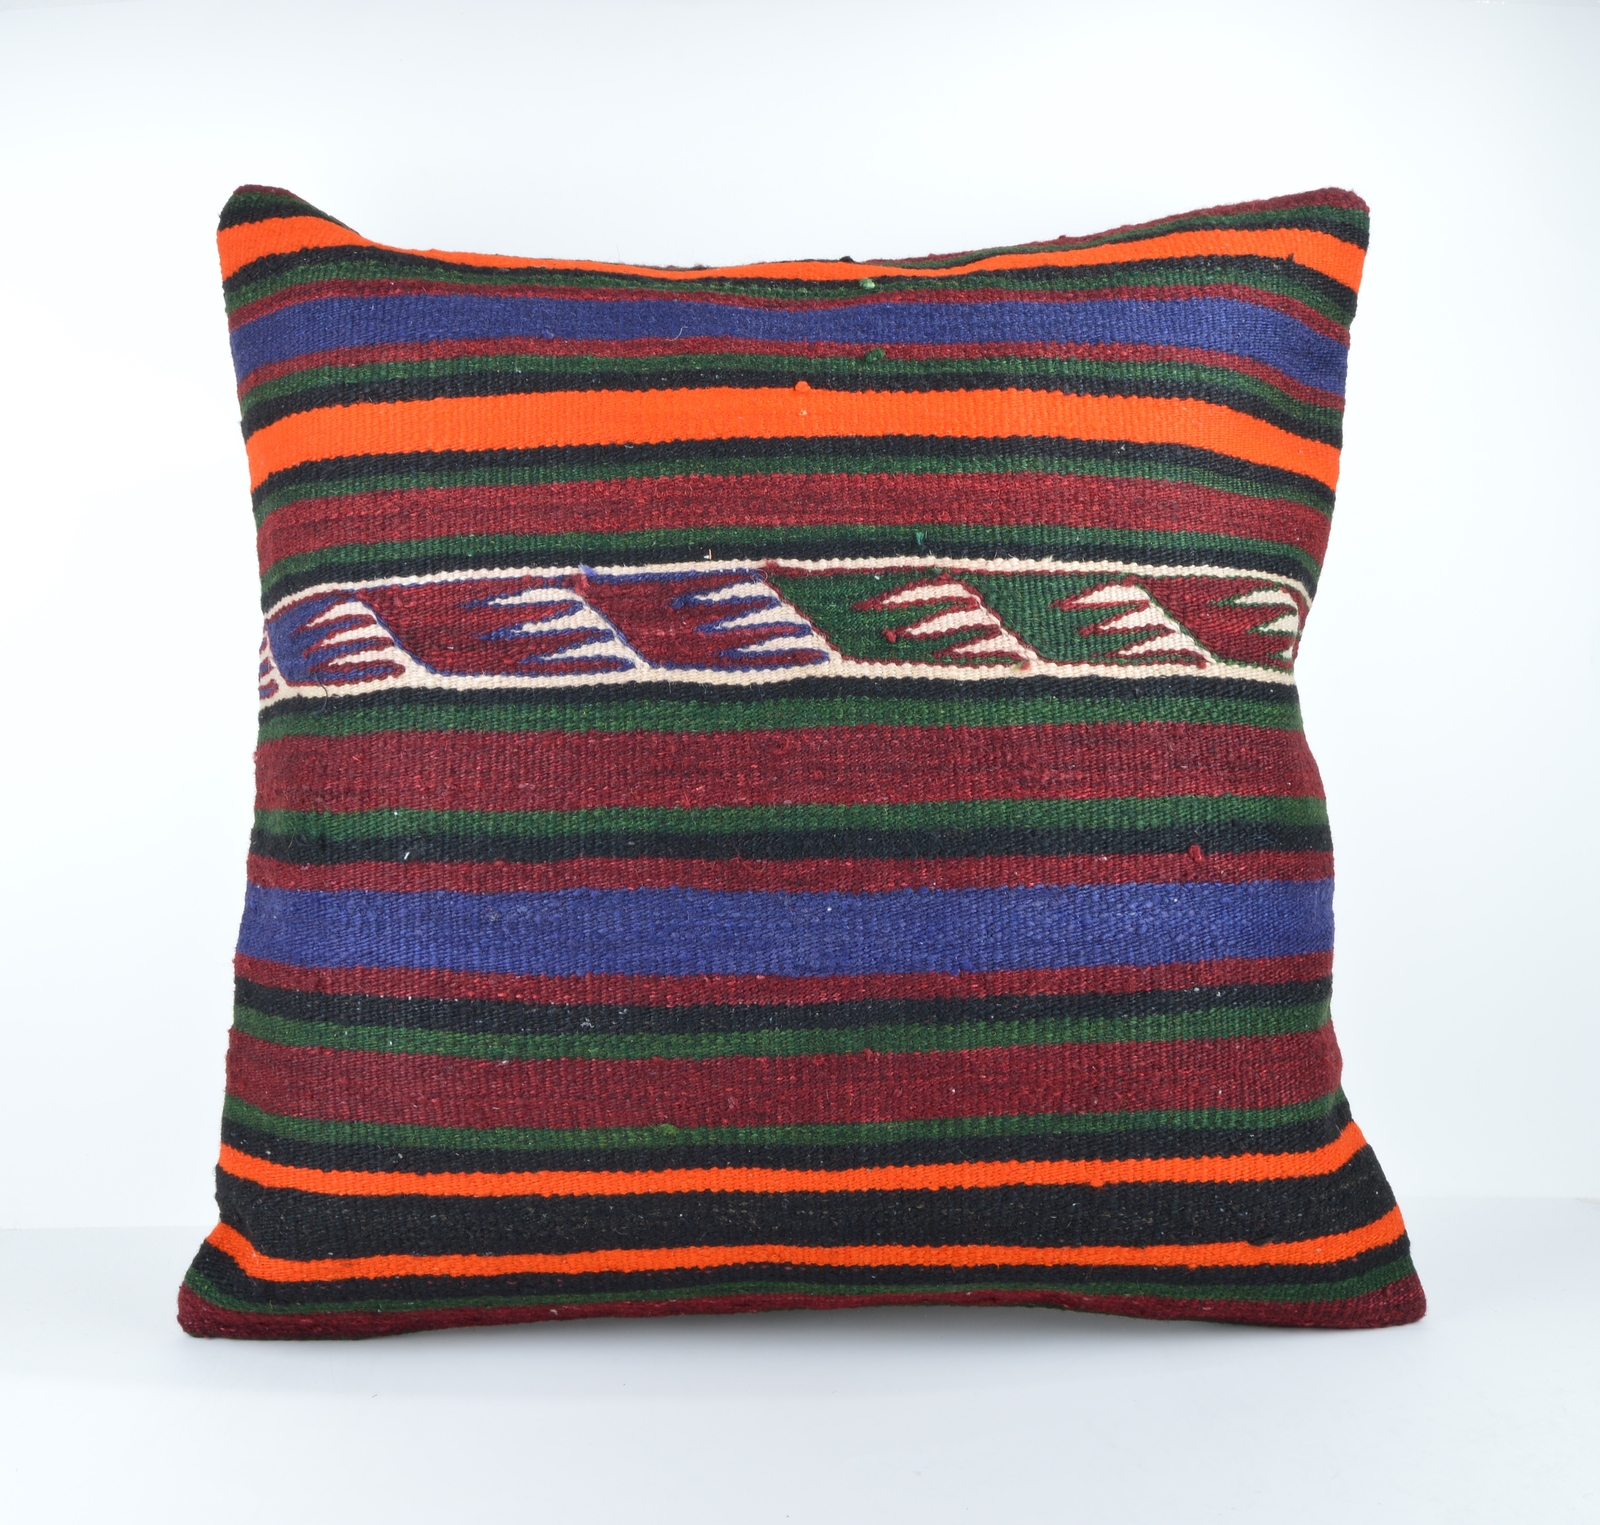 24x24 large kilim pillow big pillow decorative pillow cover large cushion case - Pillows